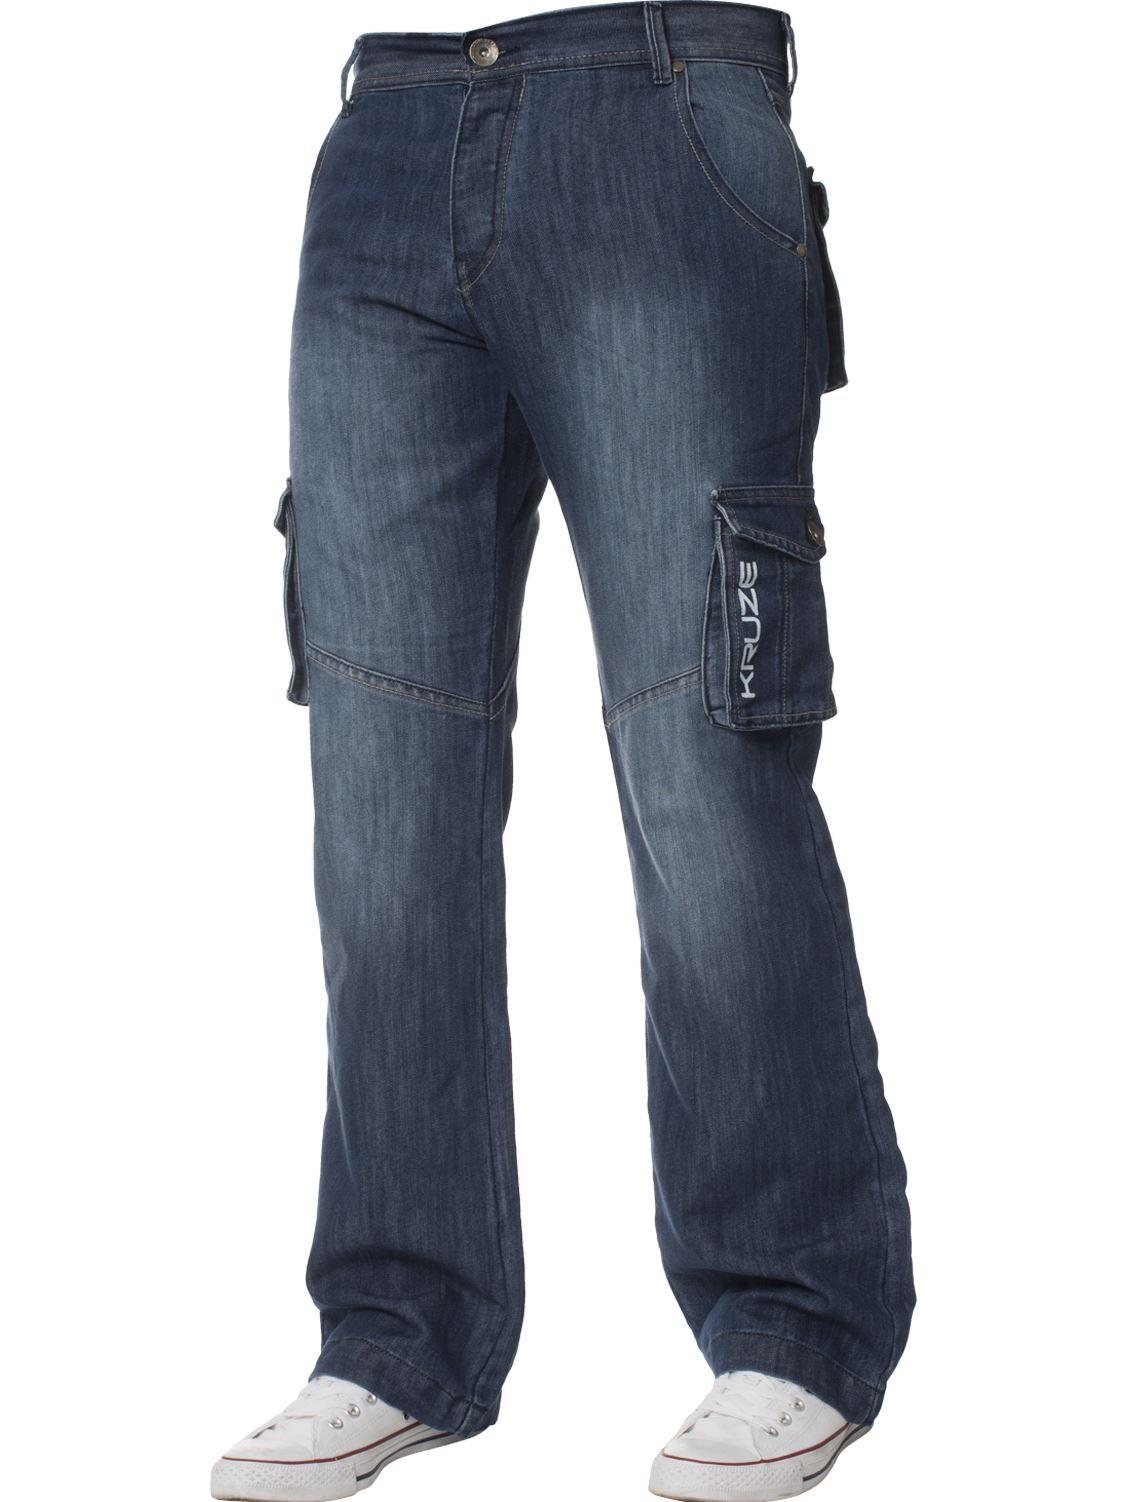 Grandes-jeans-para-hombre-de-combate-de-Kruze-Rey-Alto-Pierna-Cargo-Pantalones-Jeans-Pantalones miniatura 6